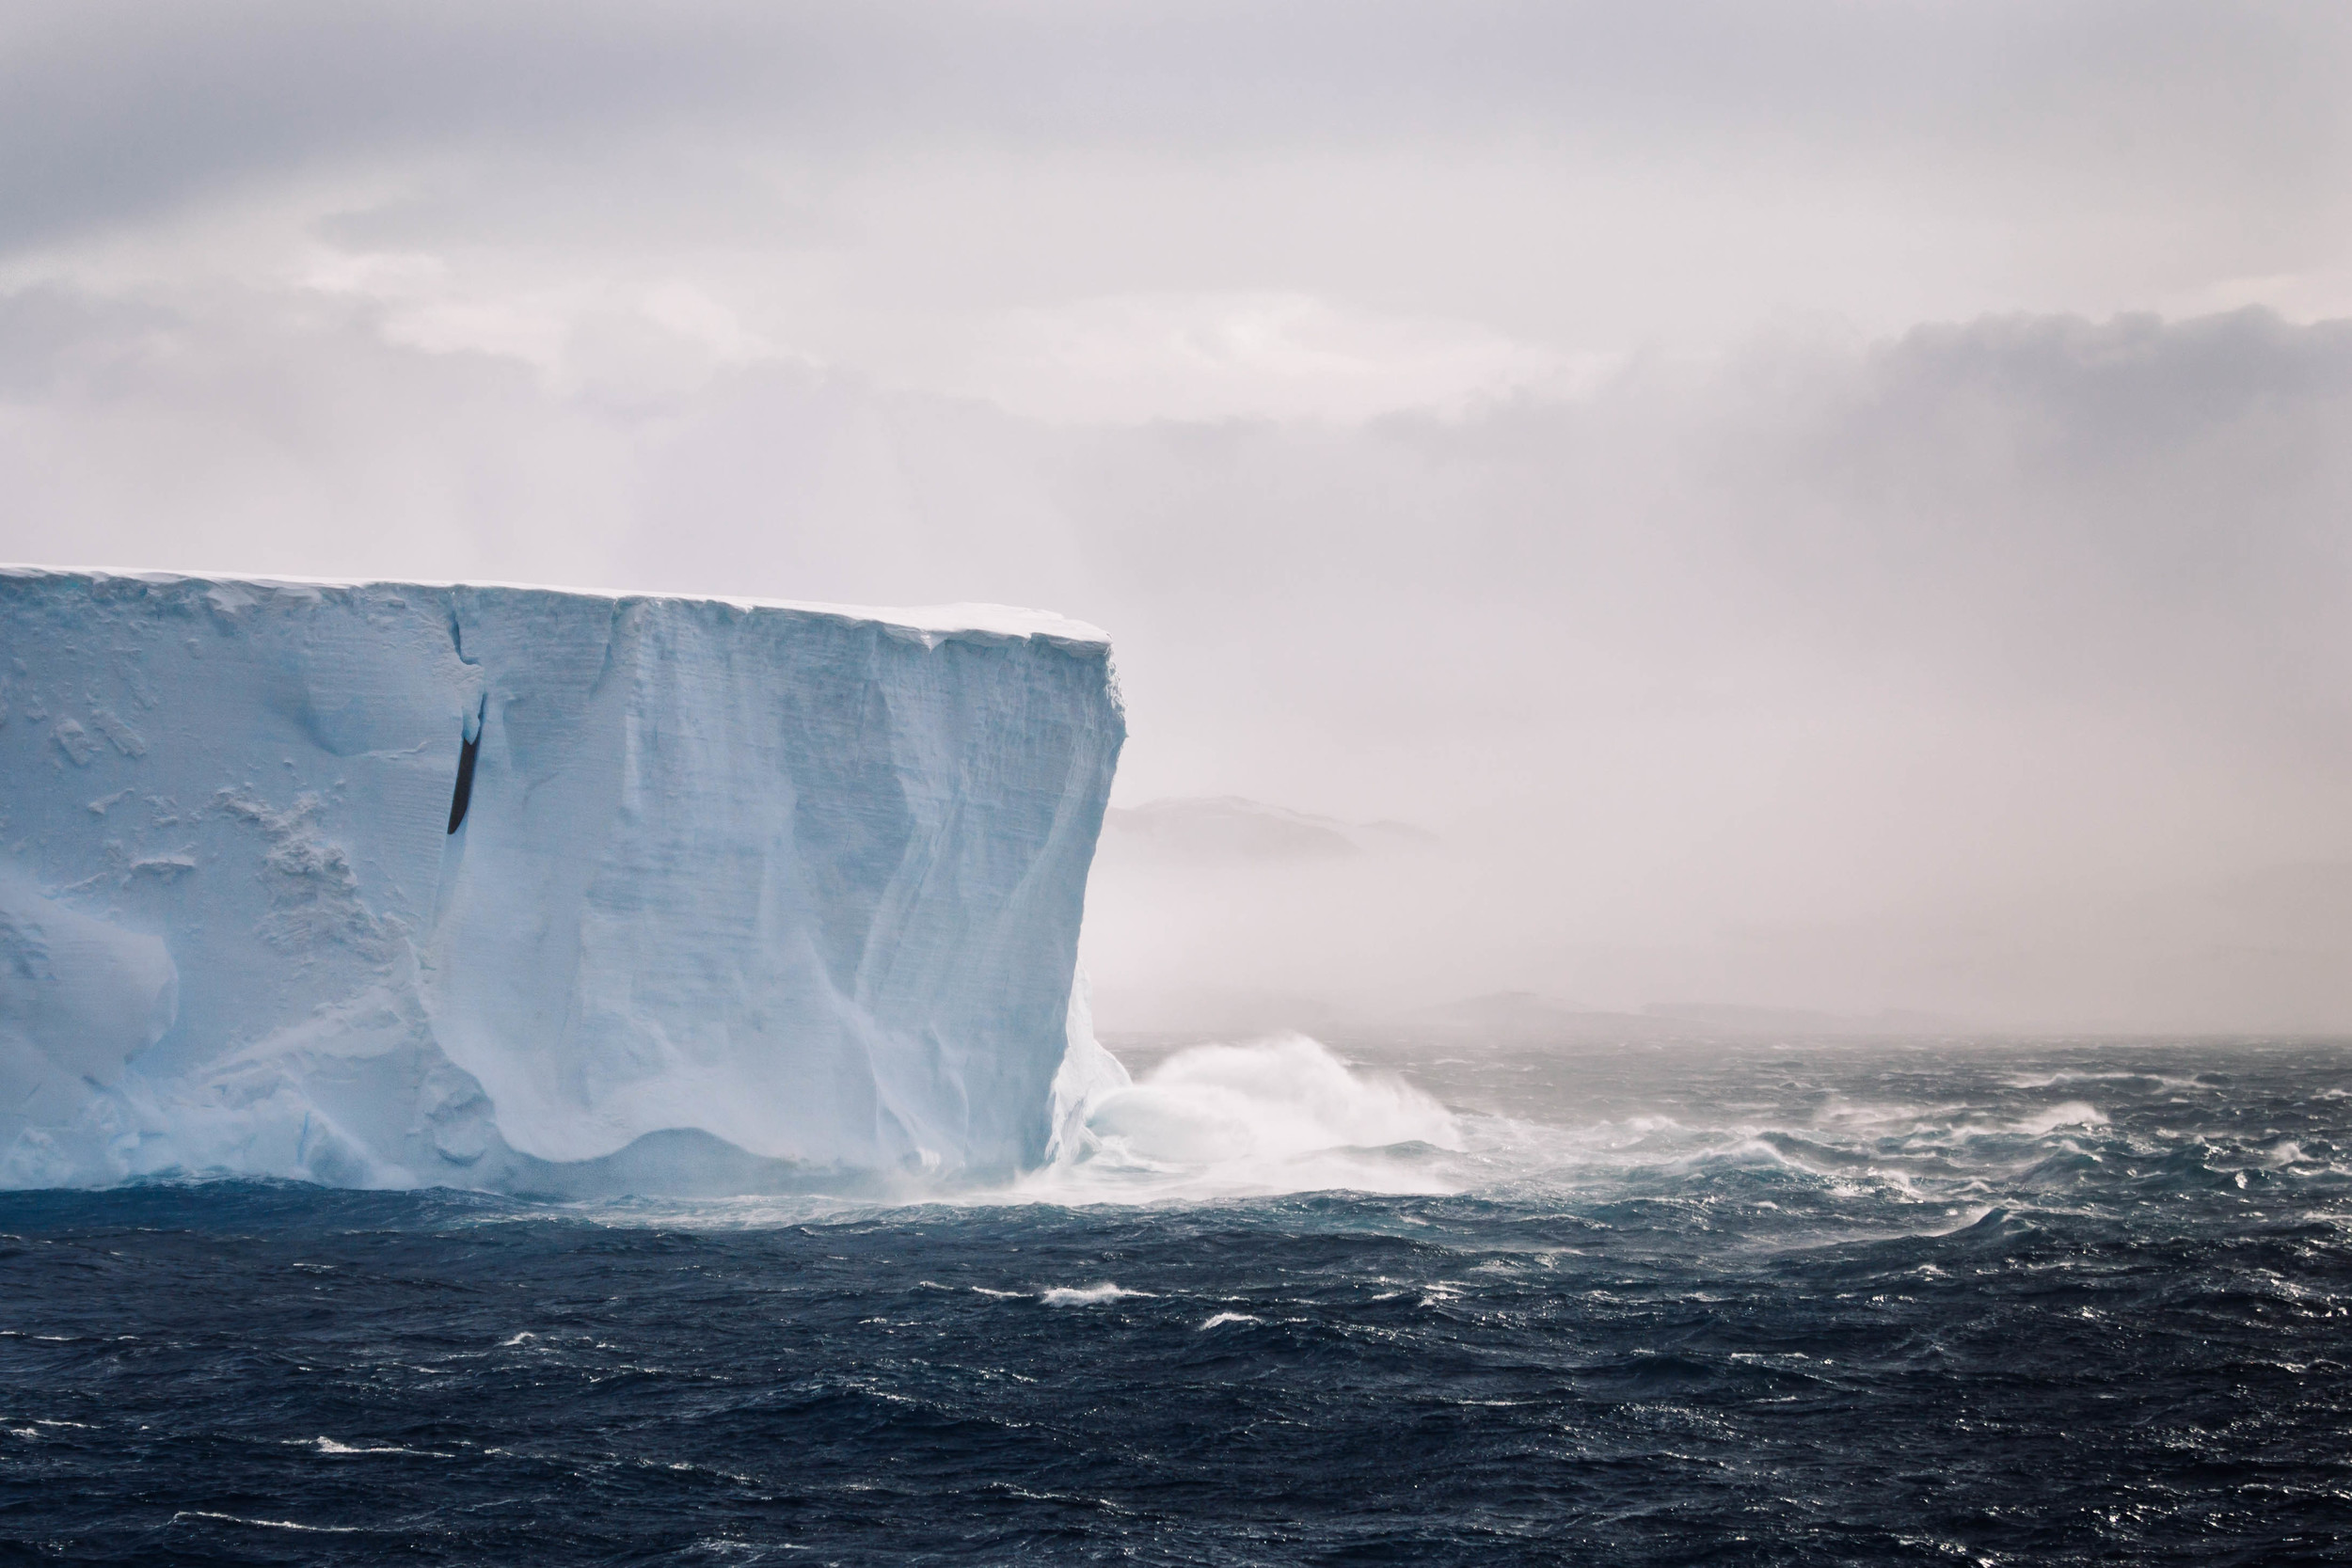 A dramatictabular iceberg takes a wave as we pass through theAntarctic Sound.